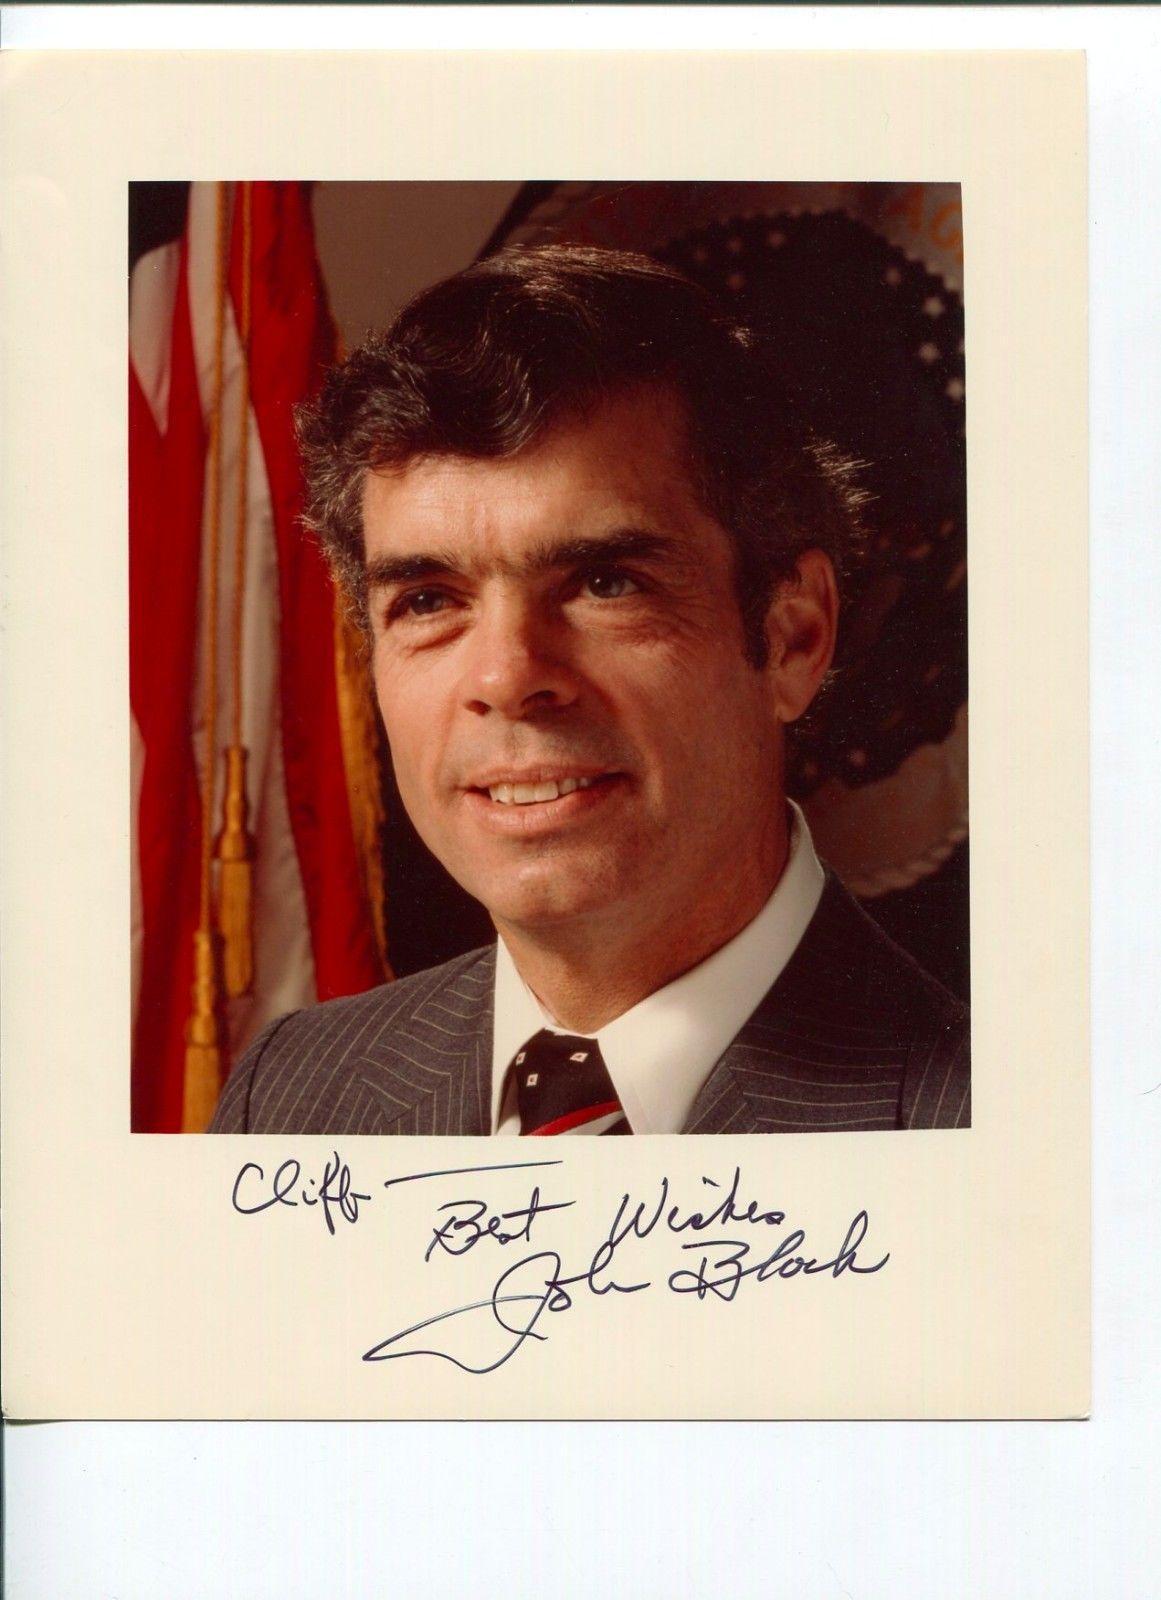 Autographed John Block Photo - Secretary Agriculture Autograph